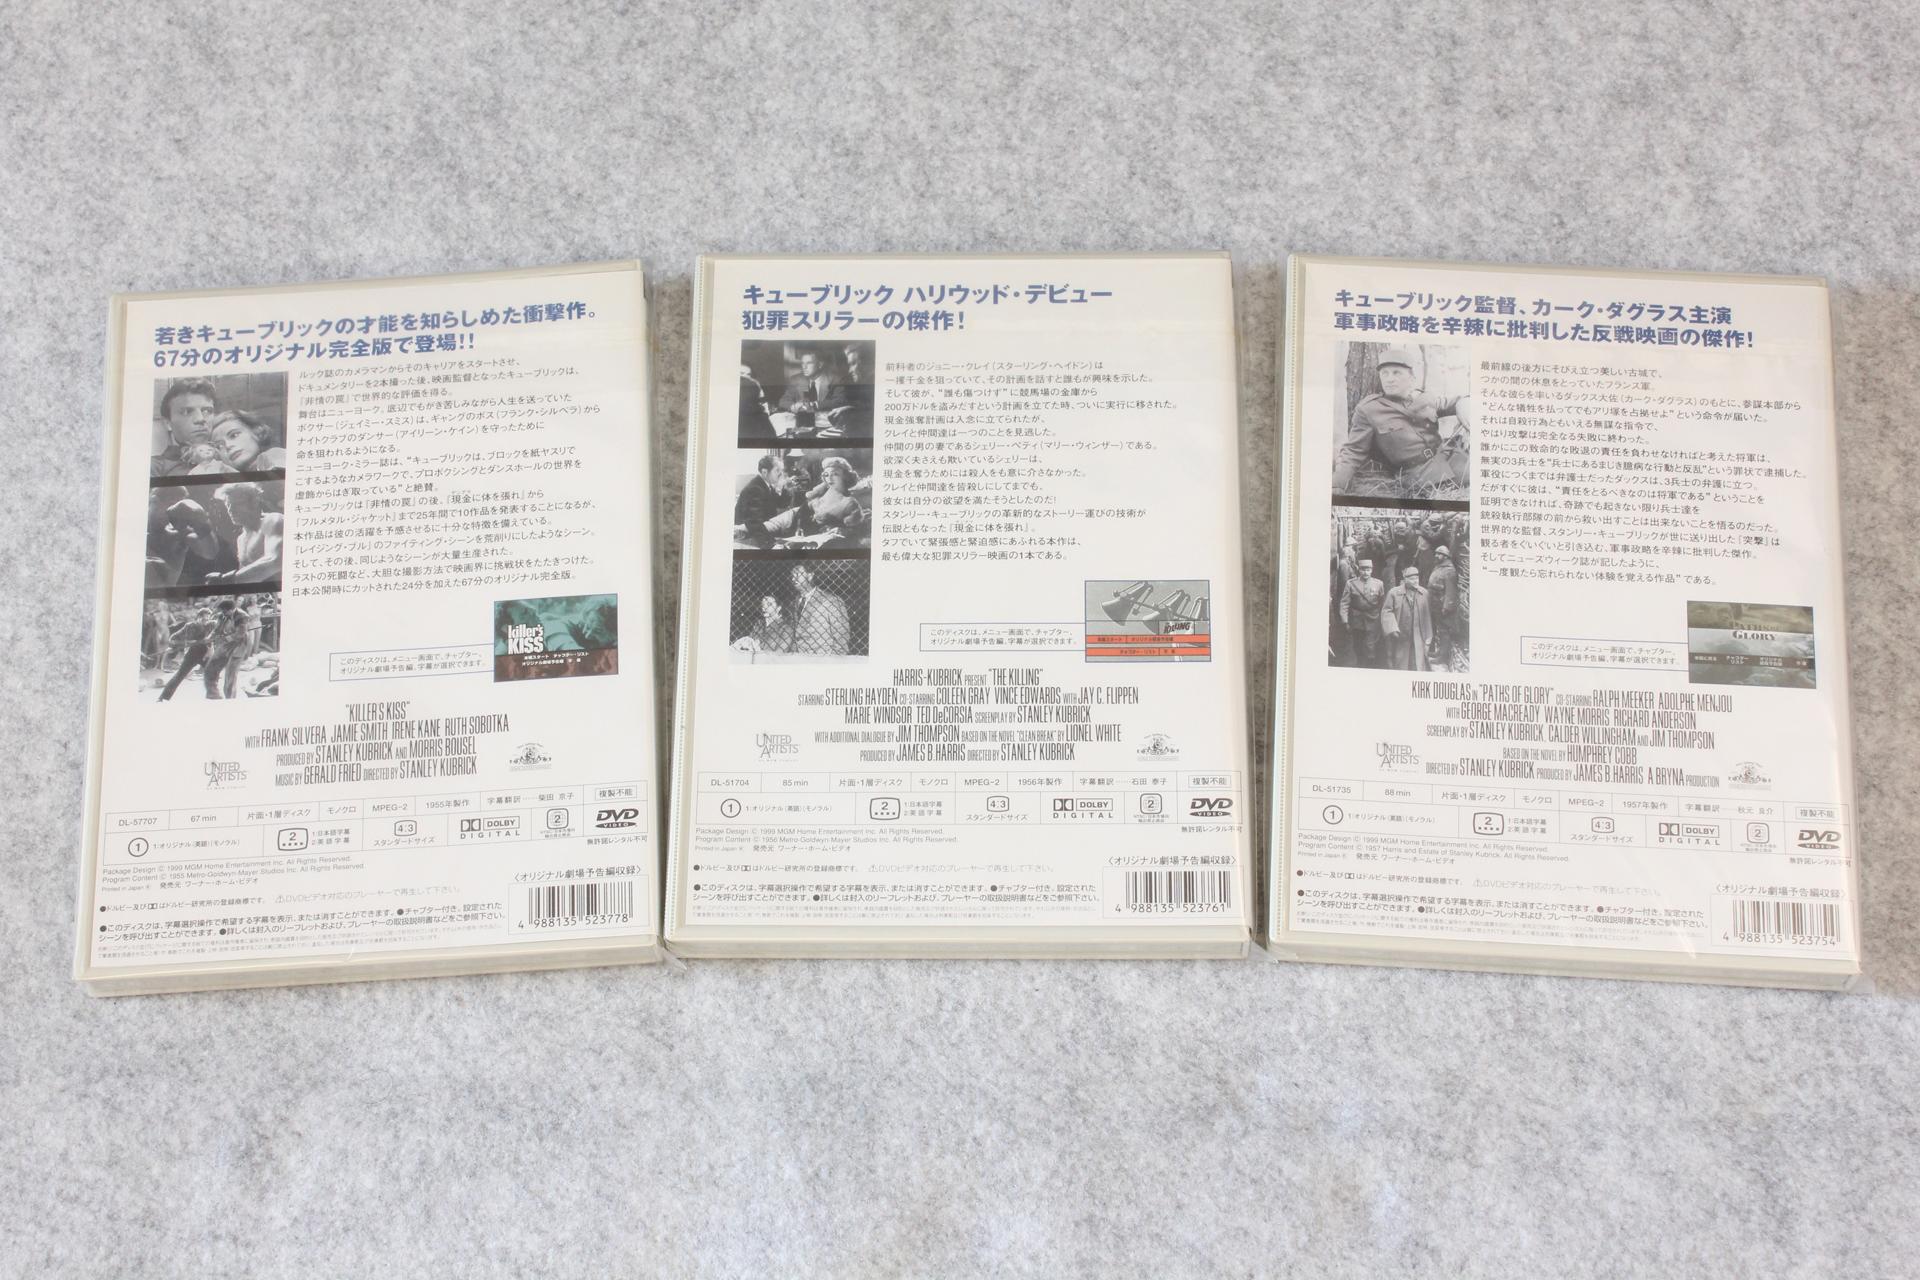 2019-11-28-KUBRICK_EARLY_WORKS-LD_DVD-8.JPG